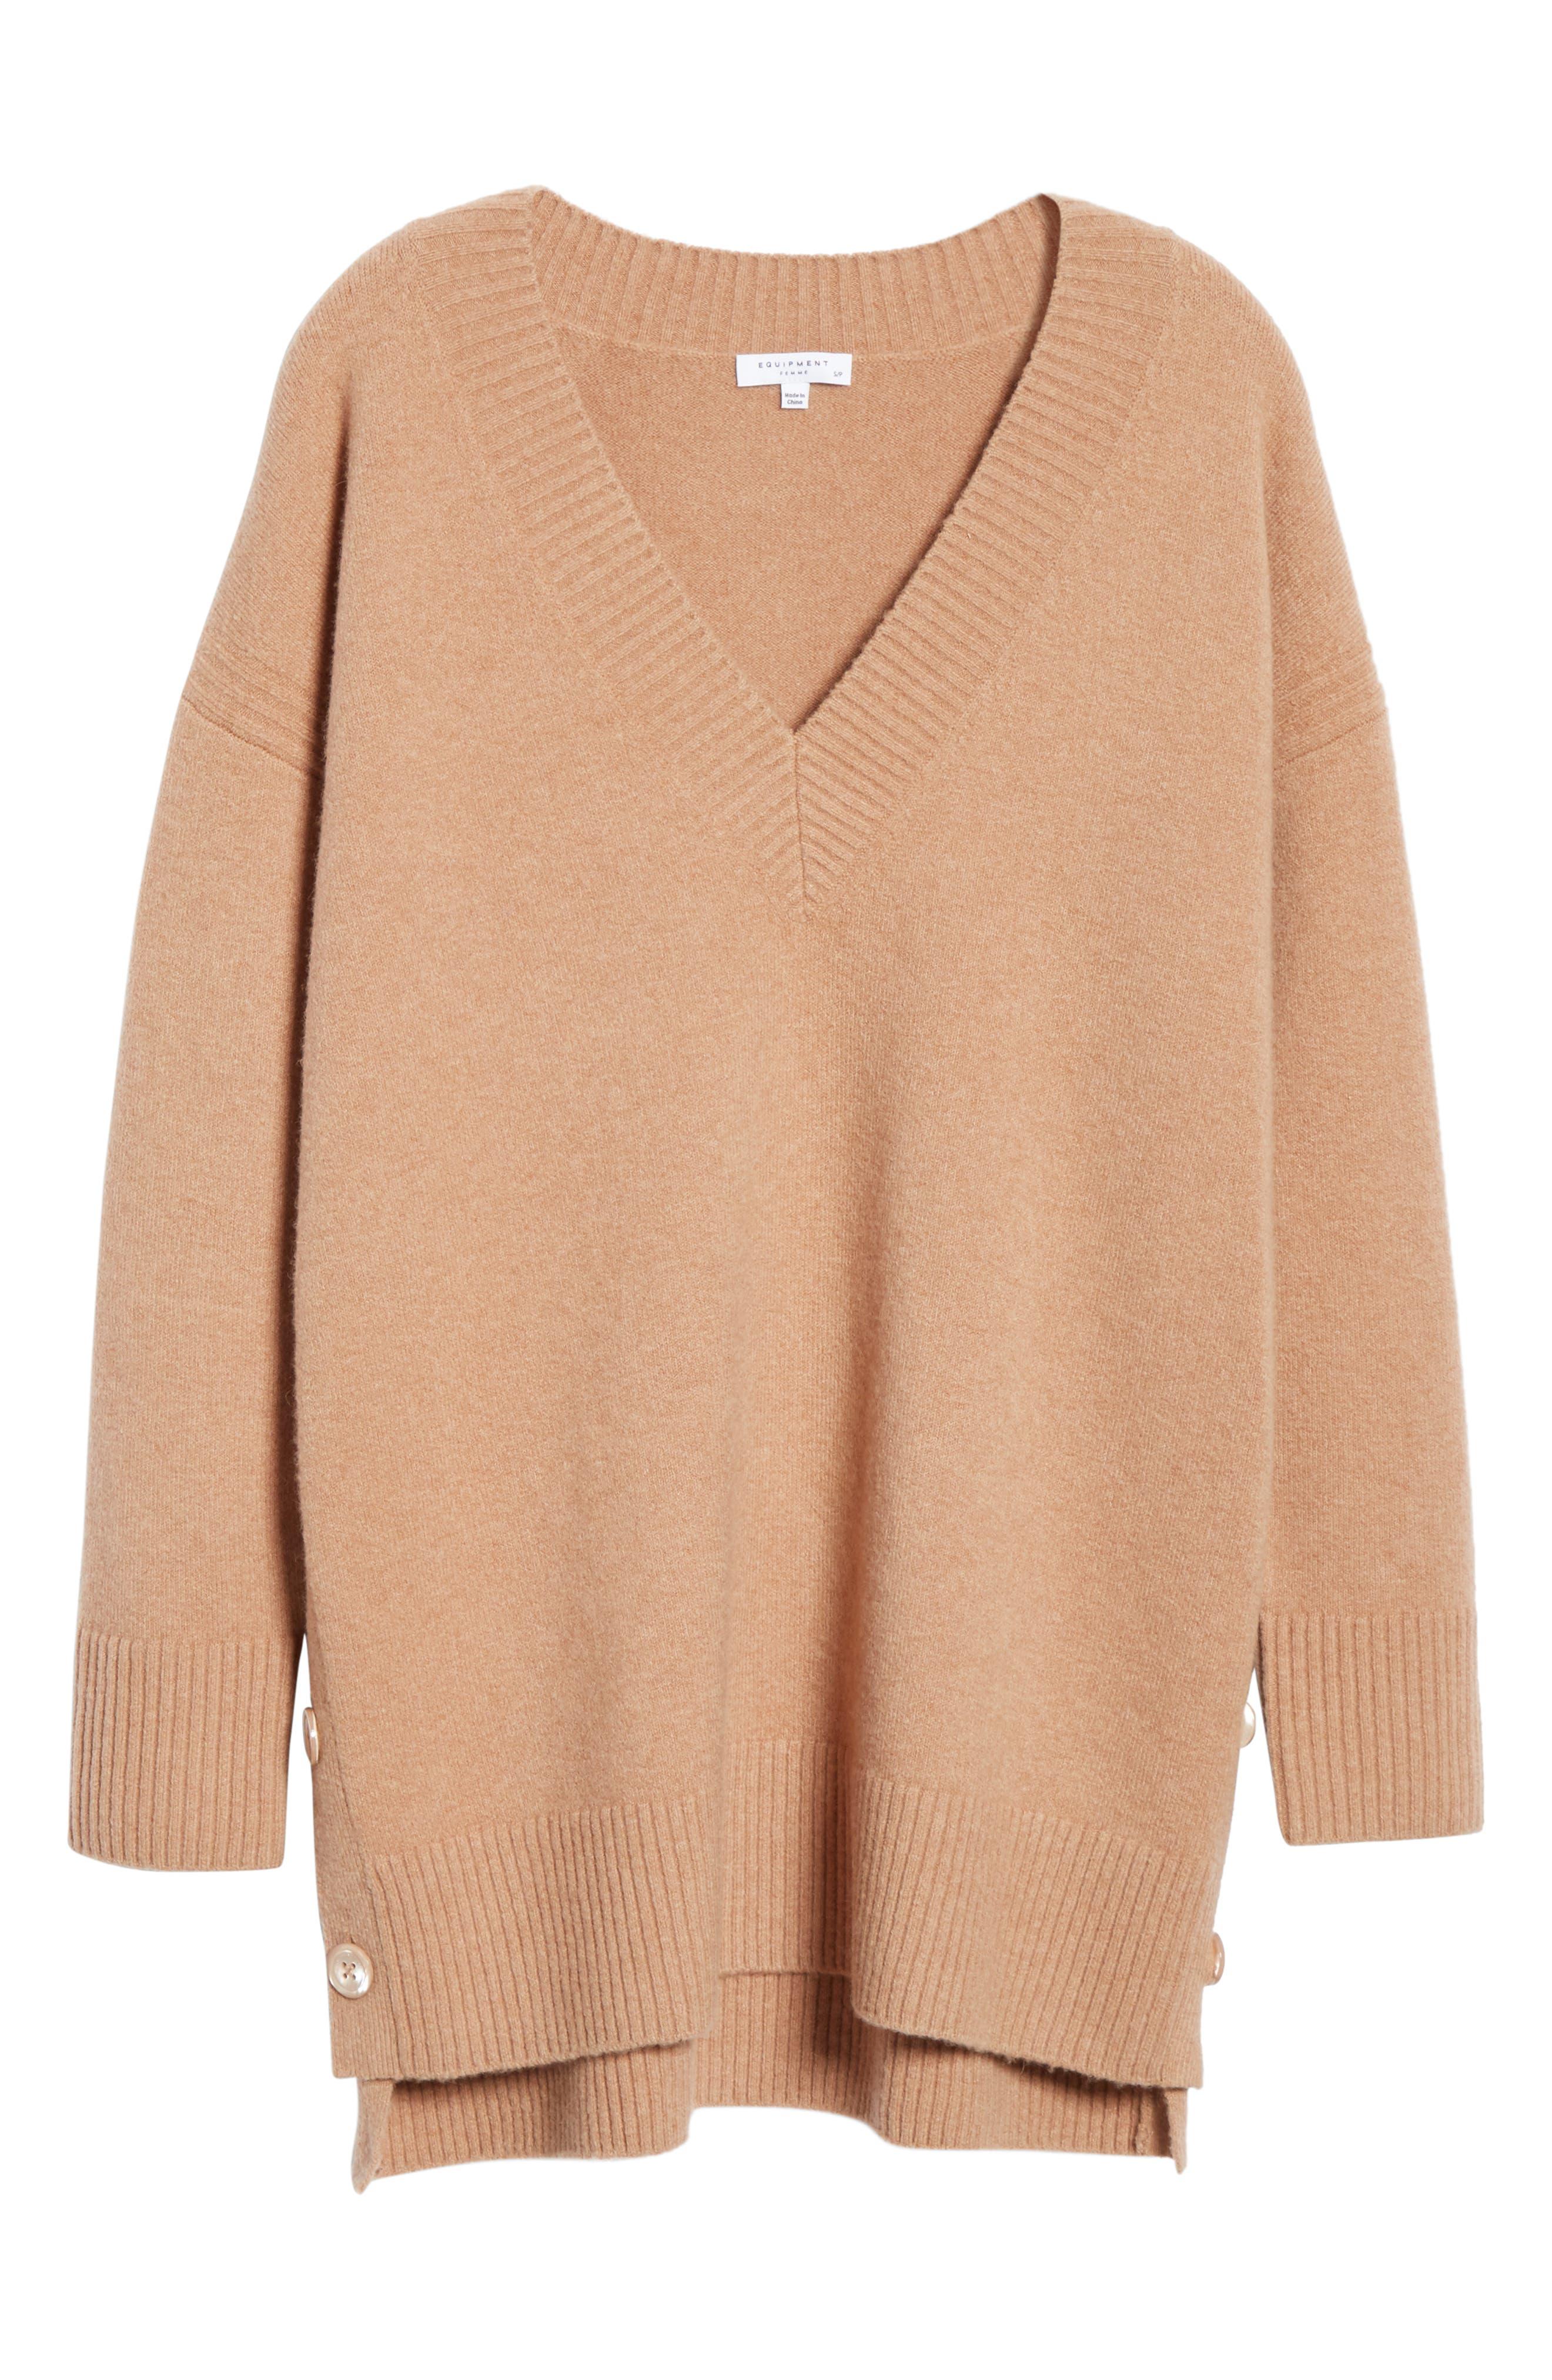 Cortis Merino Wool & Alpaca Blend Sweater,                             Alternate thumbnail 6, color,                             CAMEL